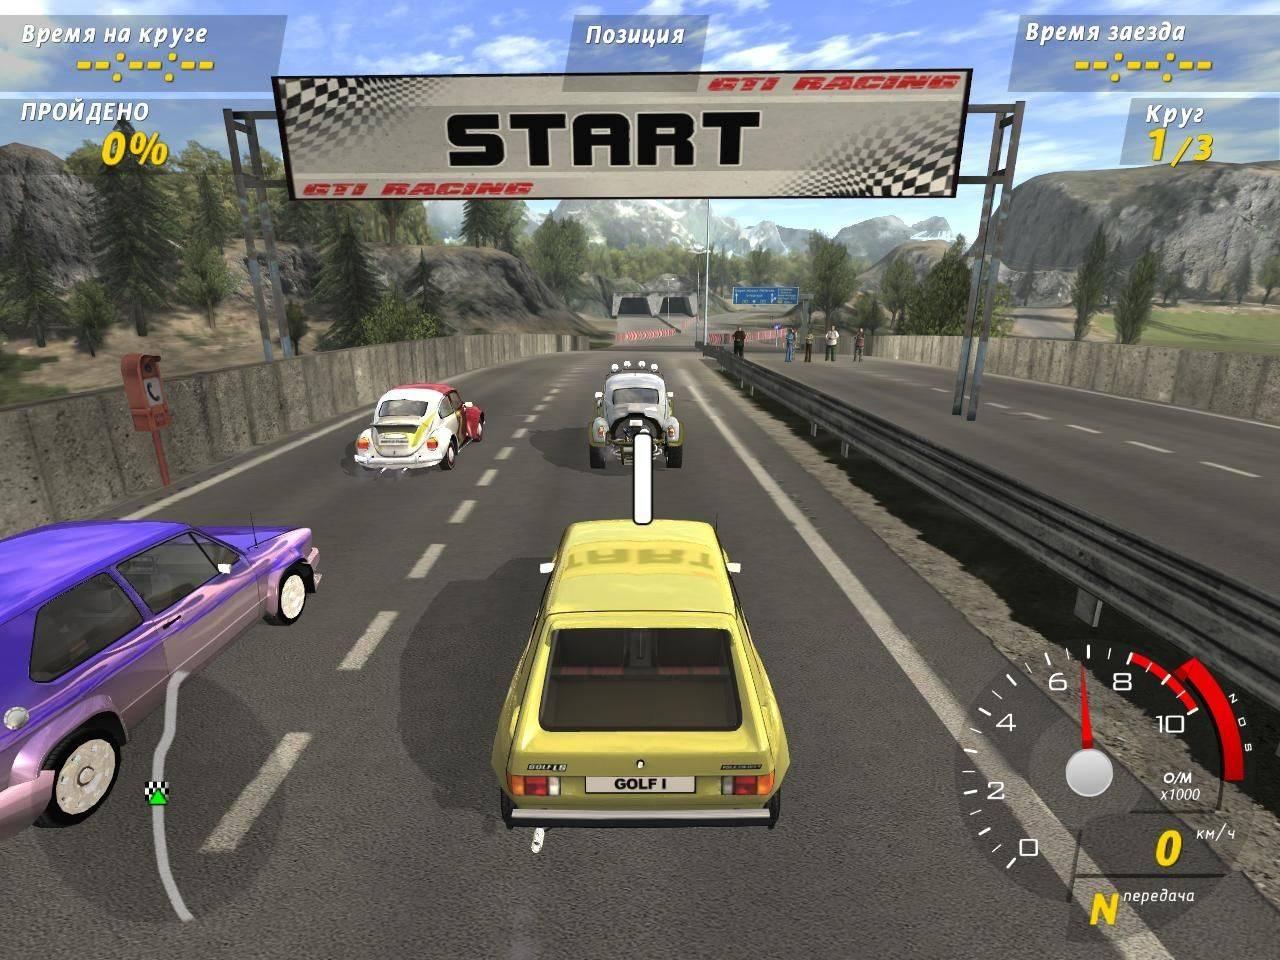 Gti racing pc torrents games.